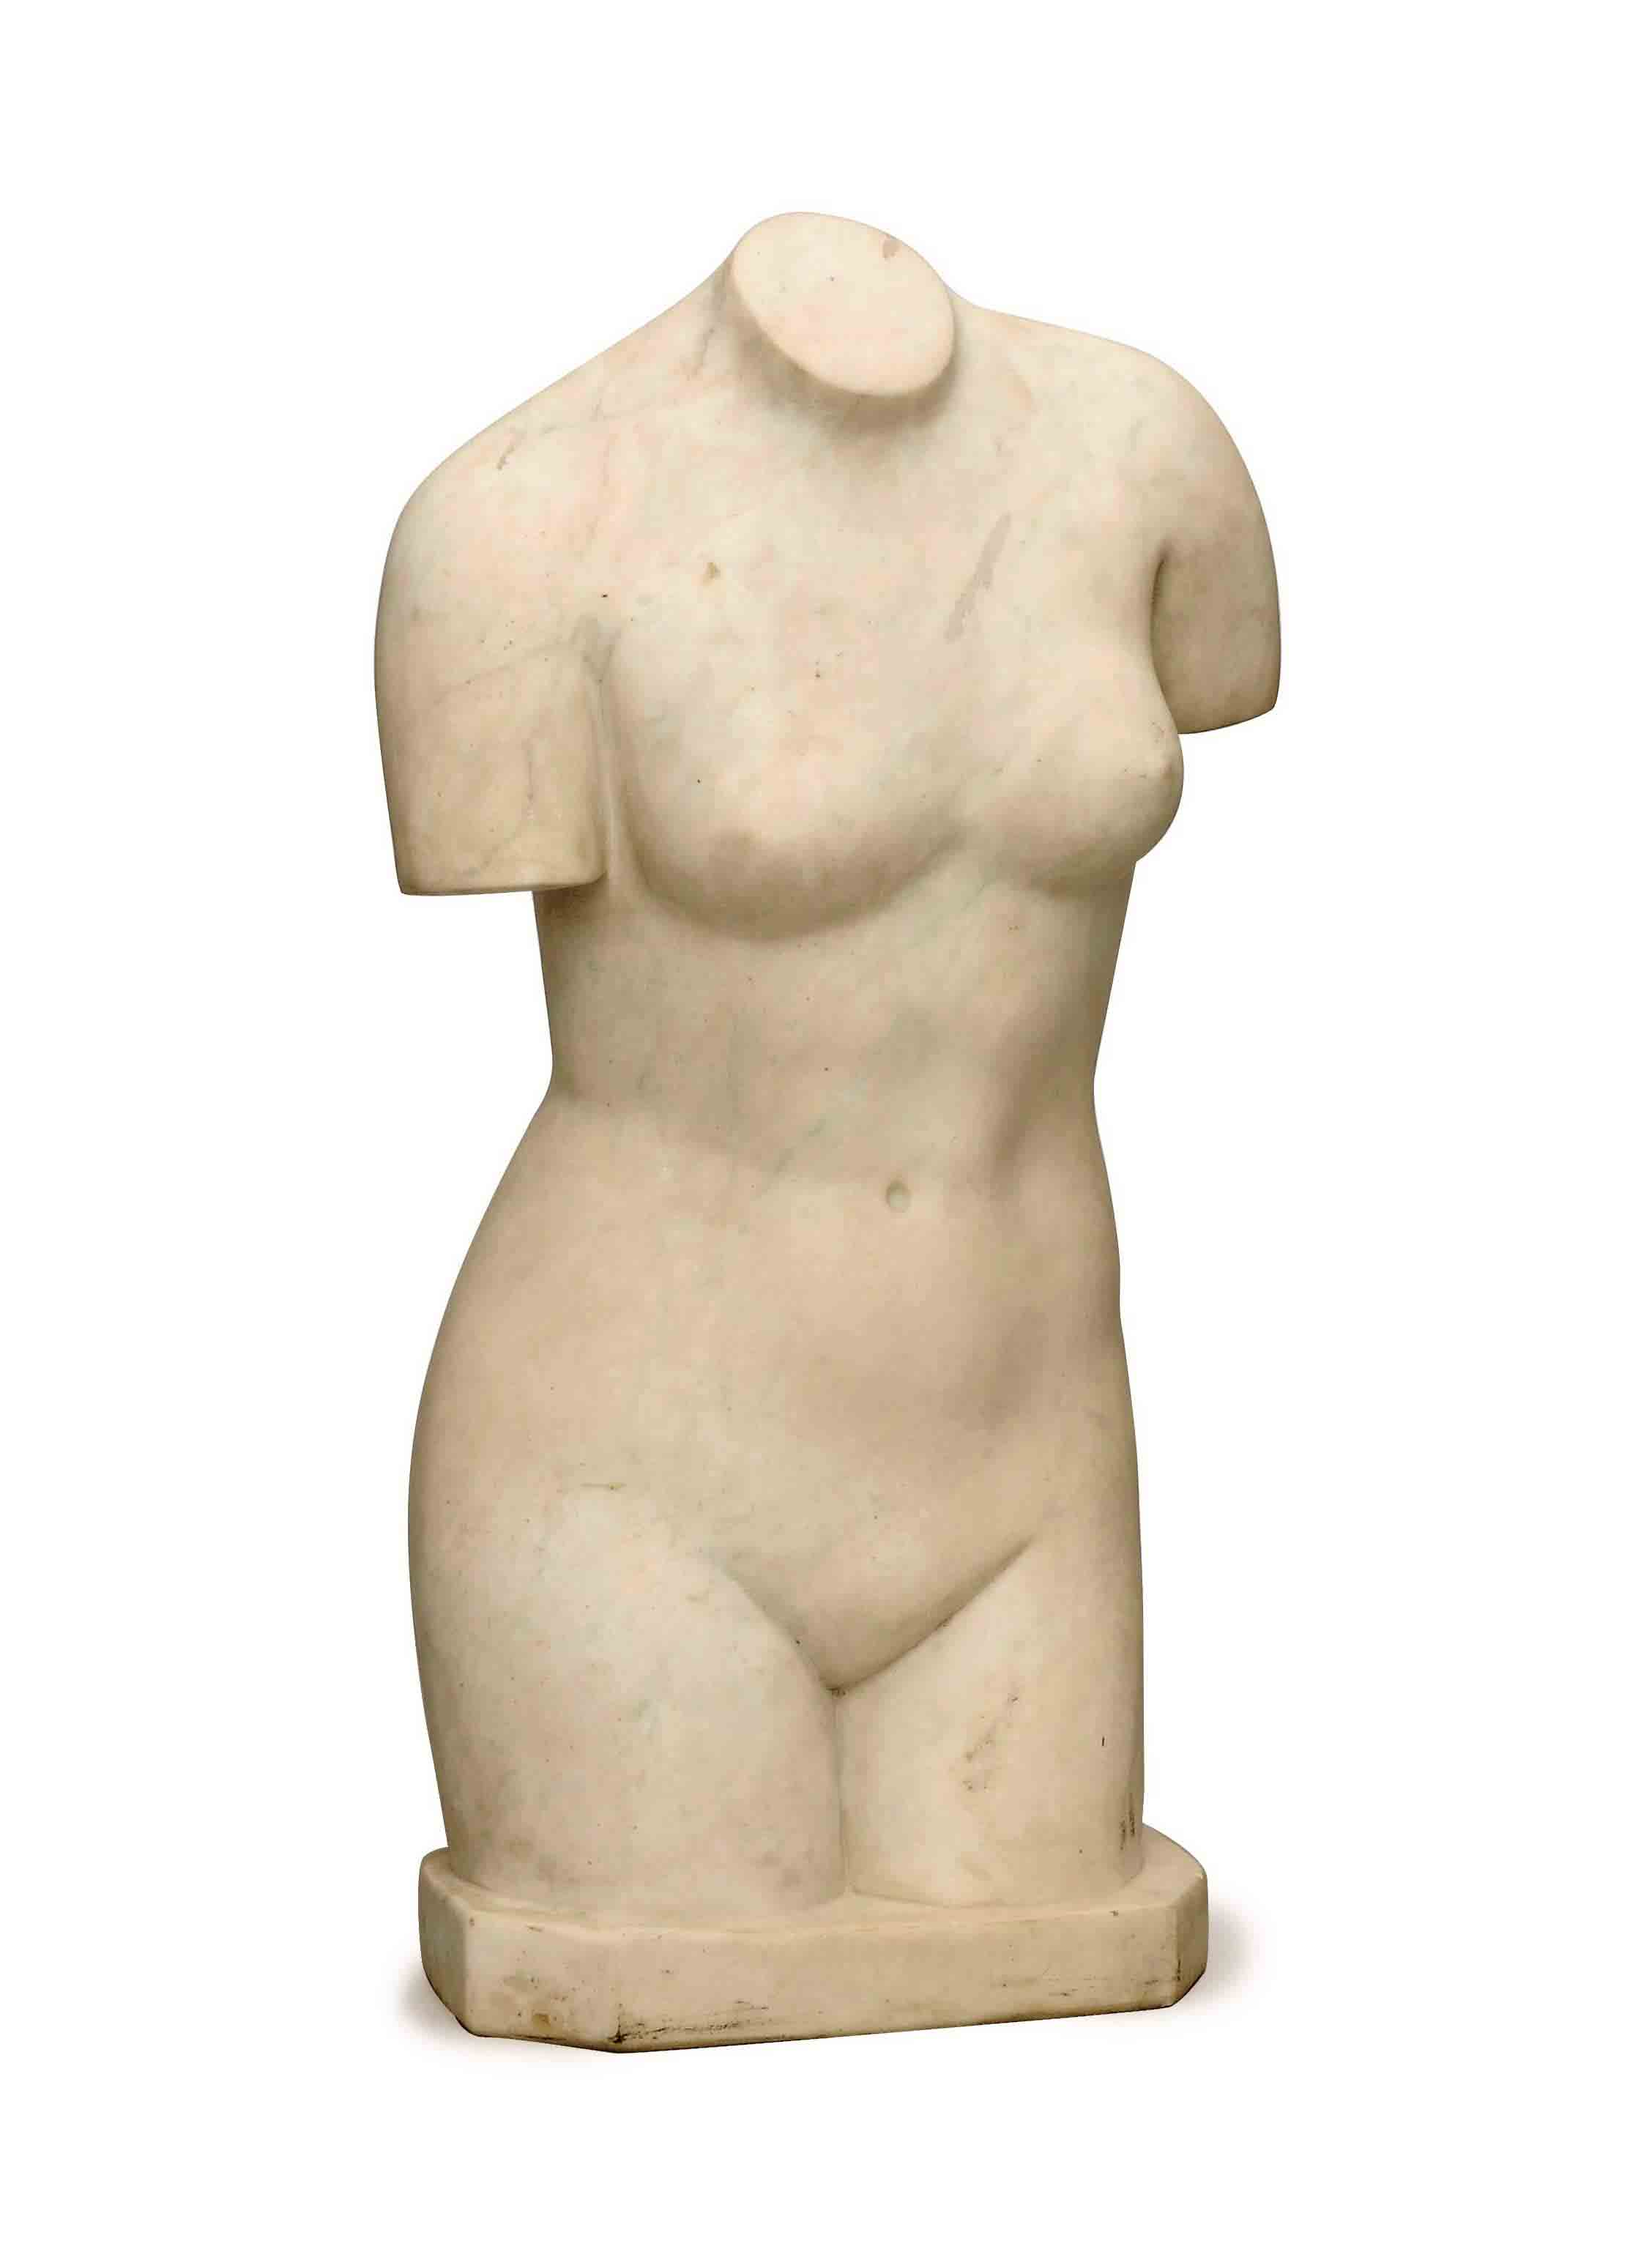 Asia Carrera Marble an italian carrera marble sculpture of a female torso